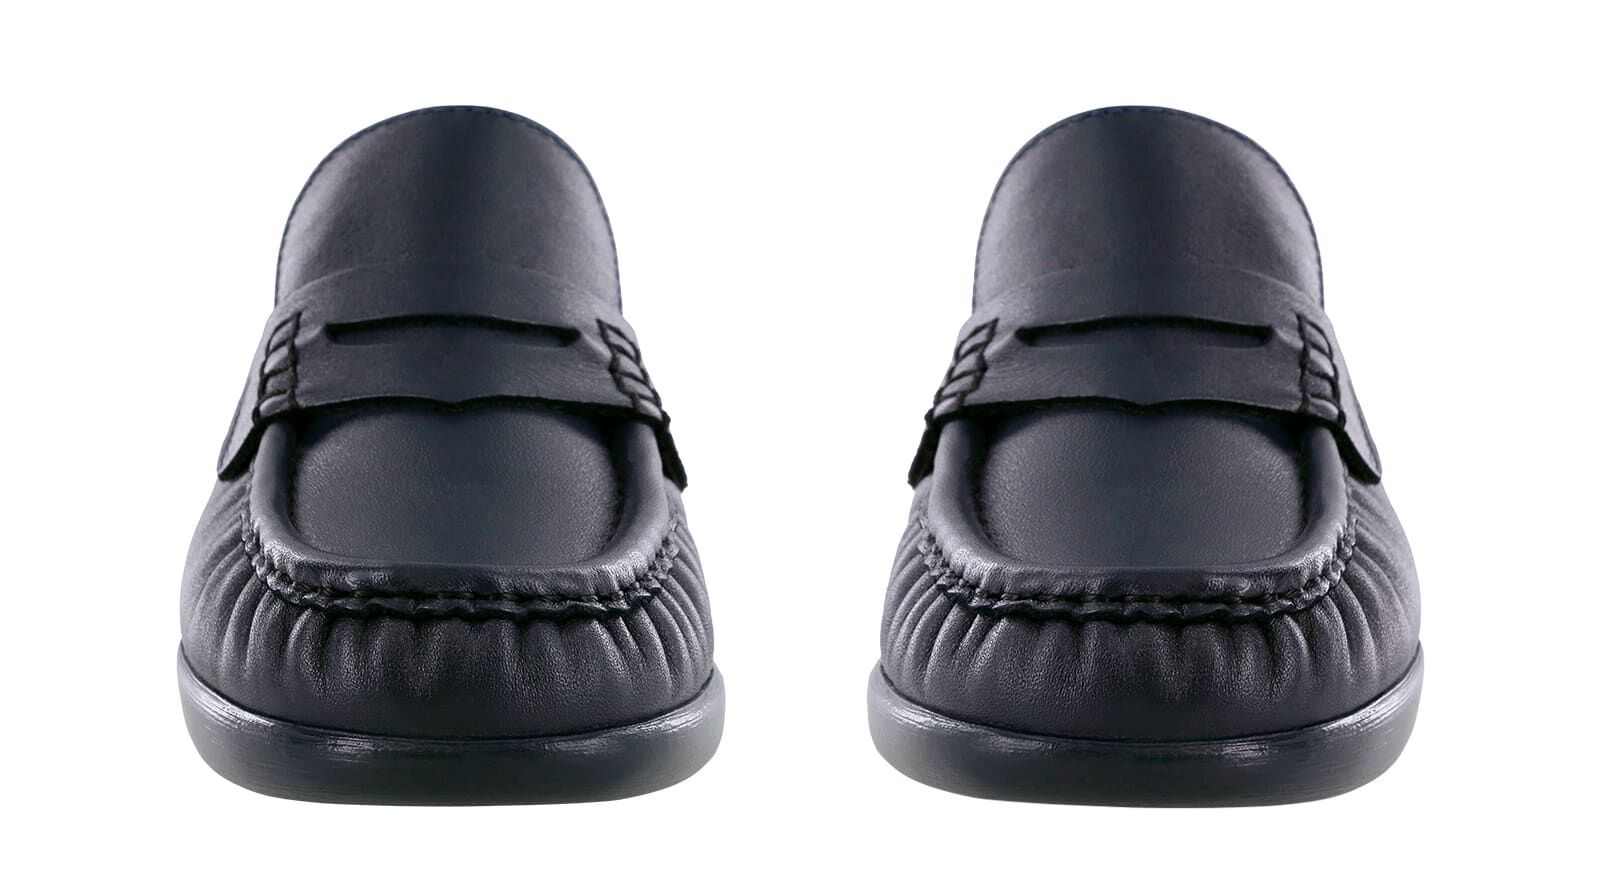 slip on loafer sneakers